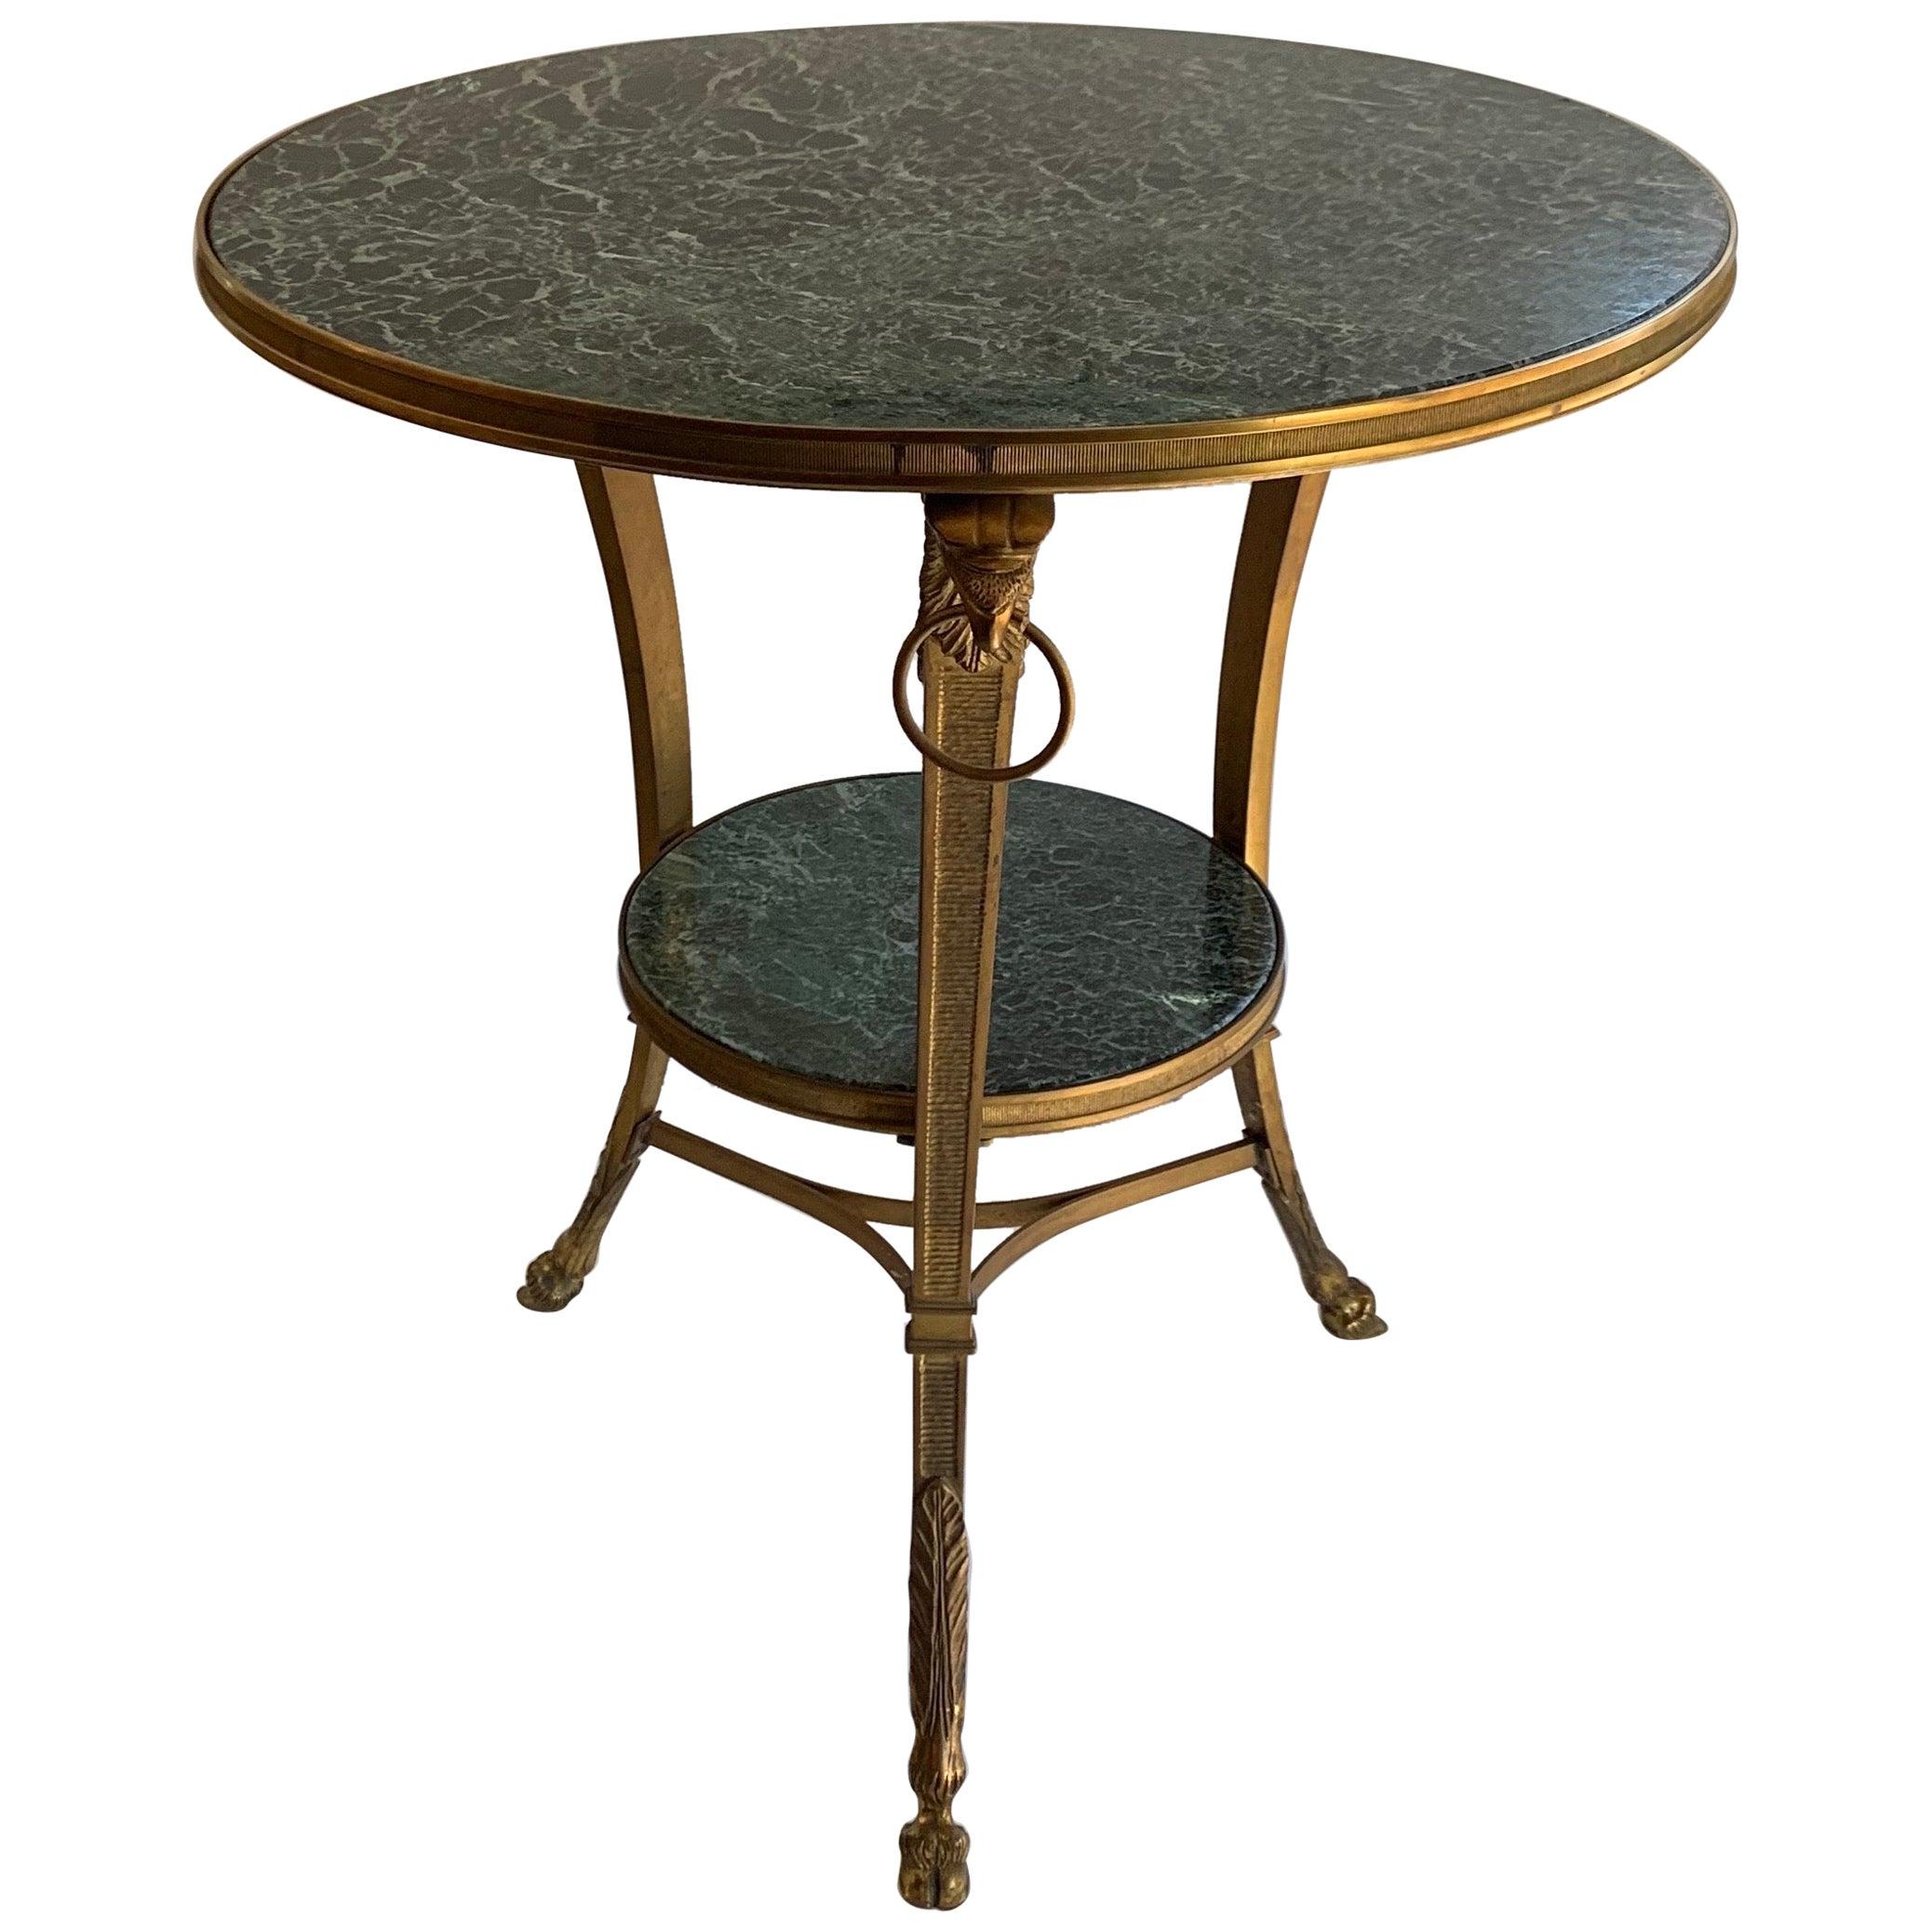 Wonderful French Louis XVI Bronze Ormolu Marble-Top Two-Tier Guéridon Table